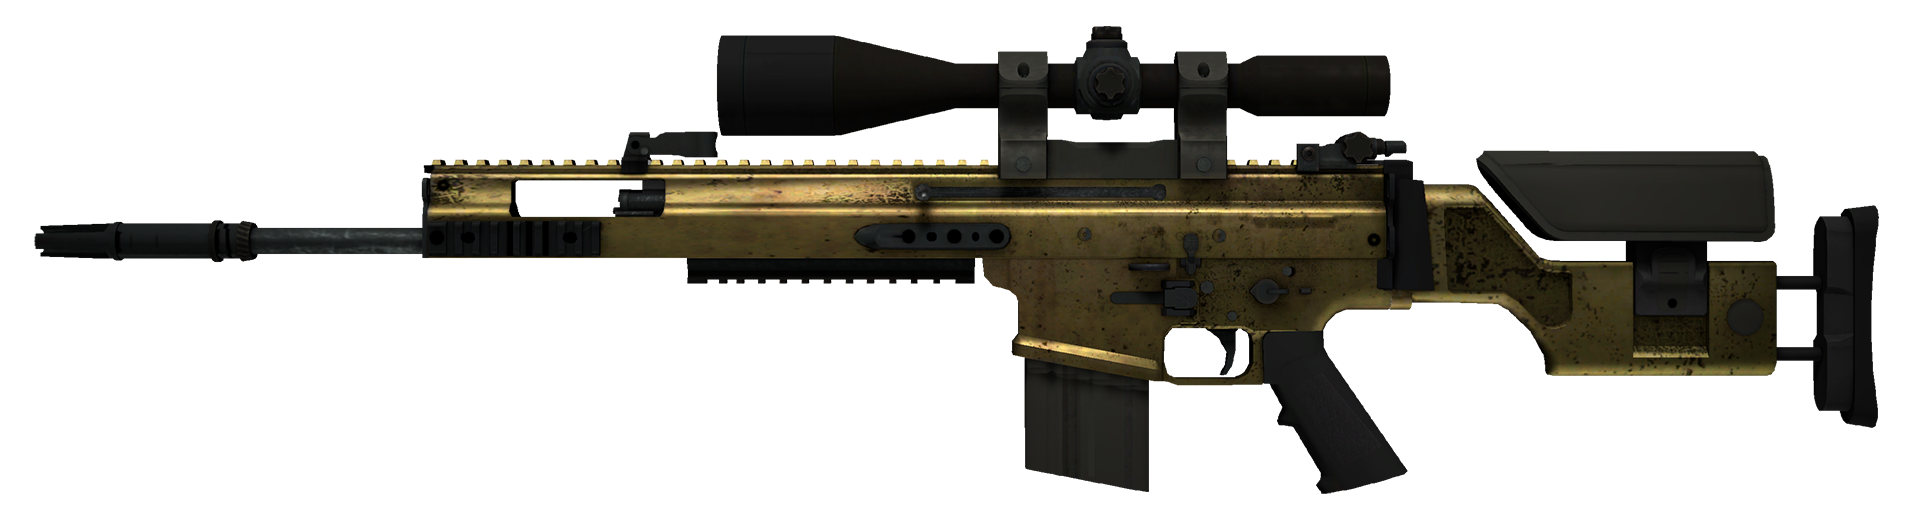 SCAR-20 Brass Large Rendering